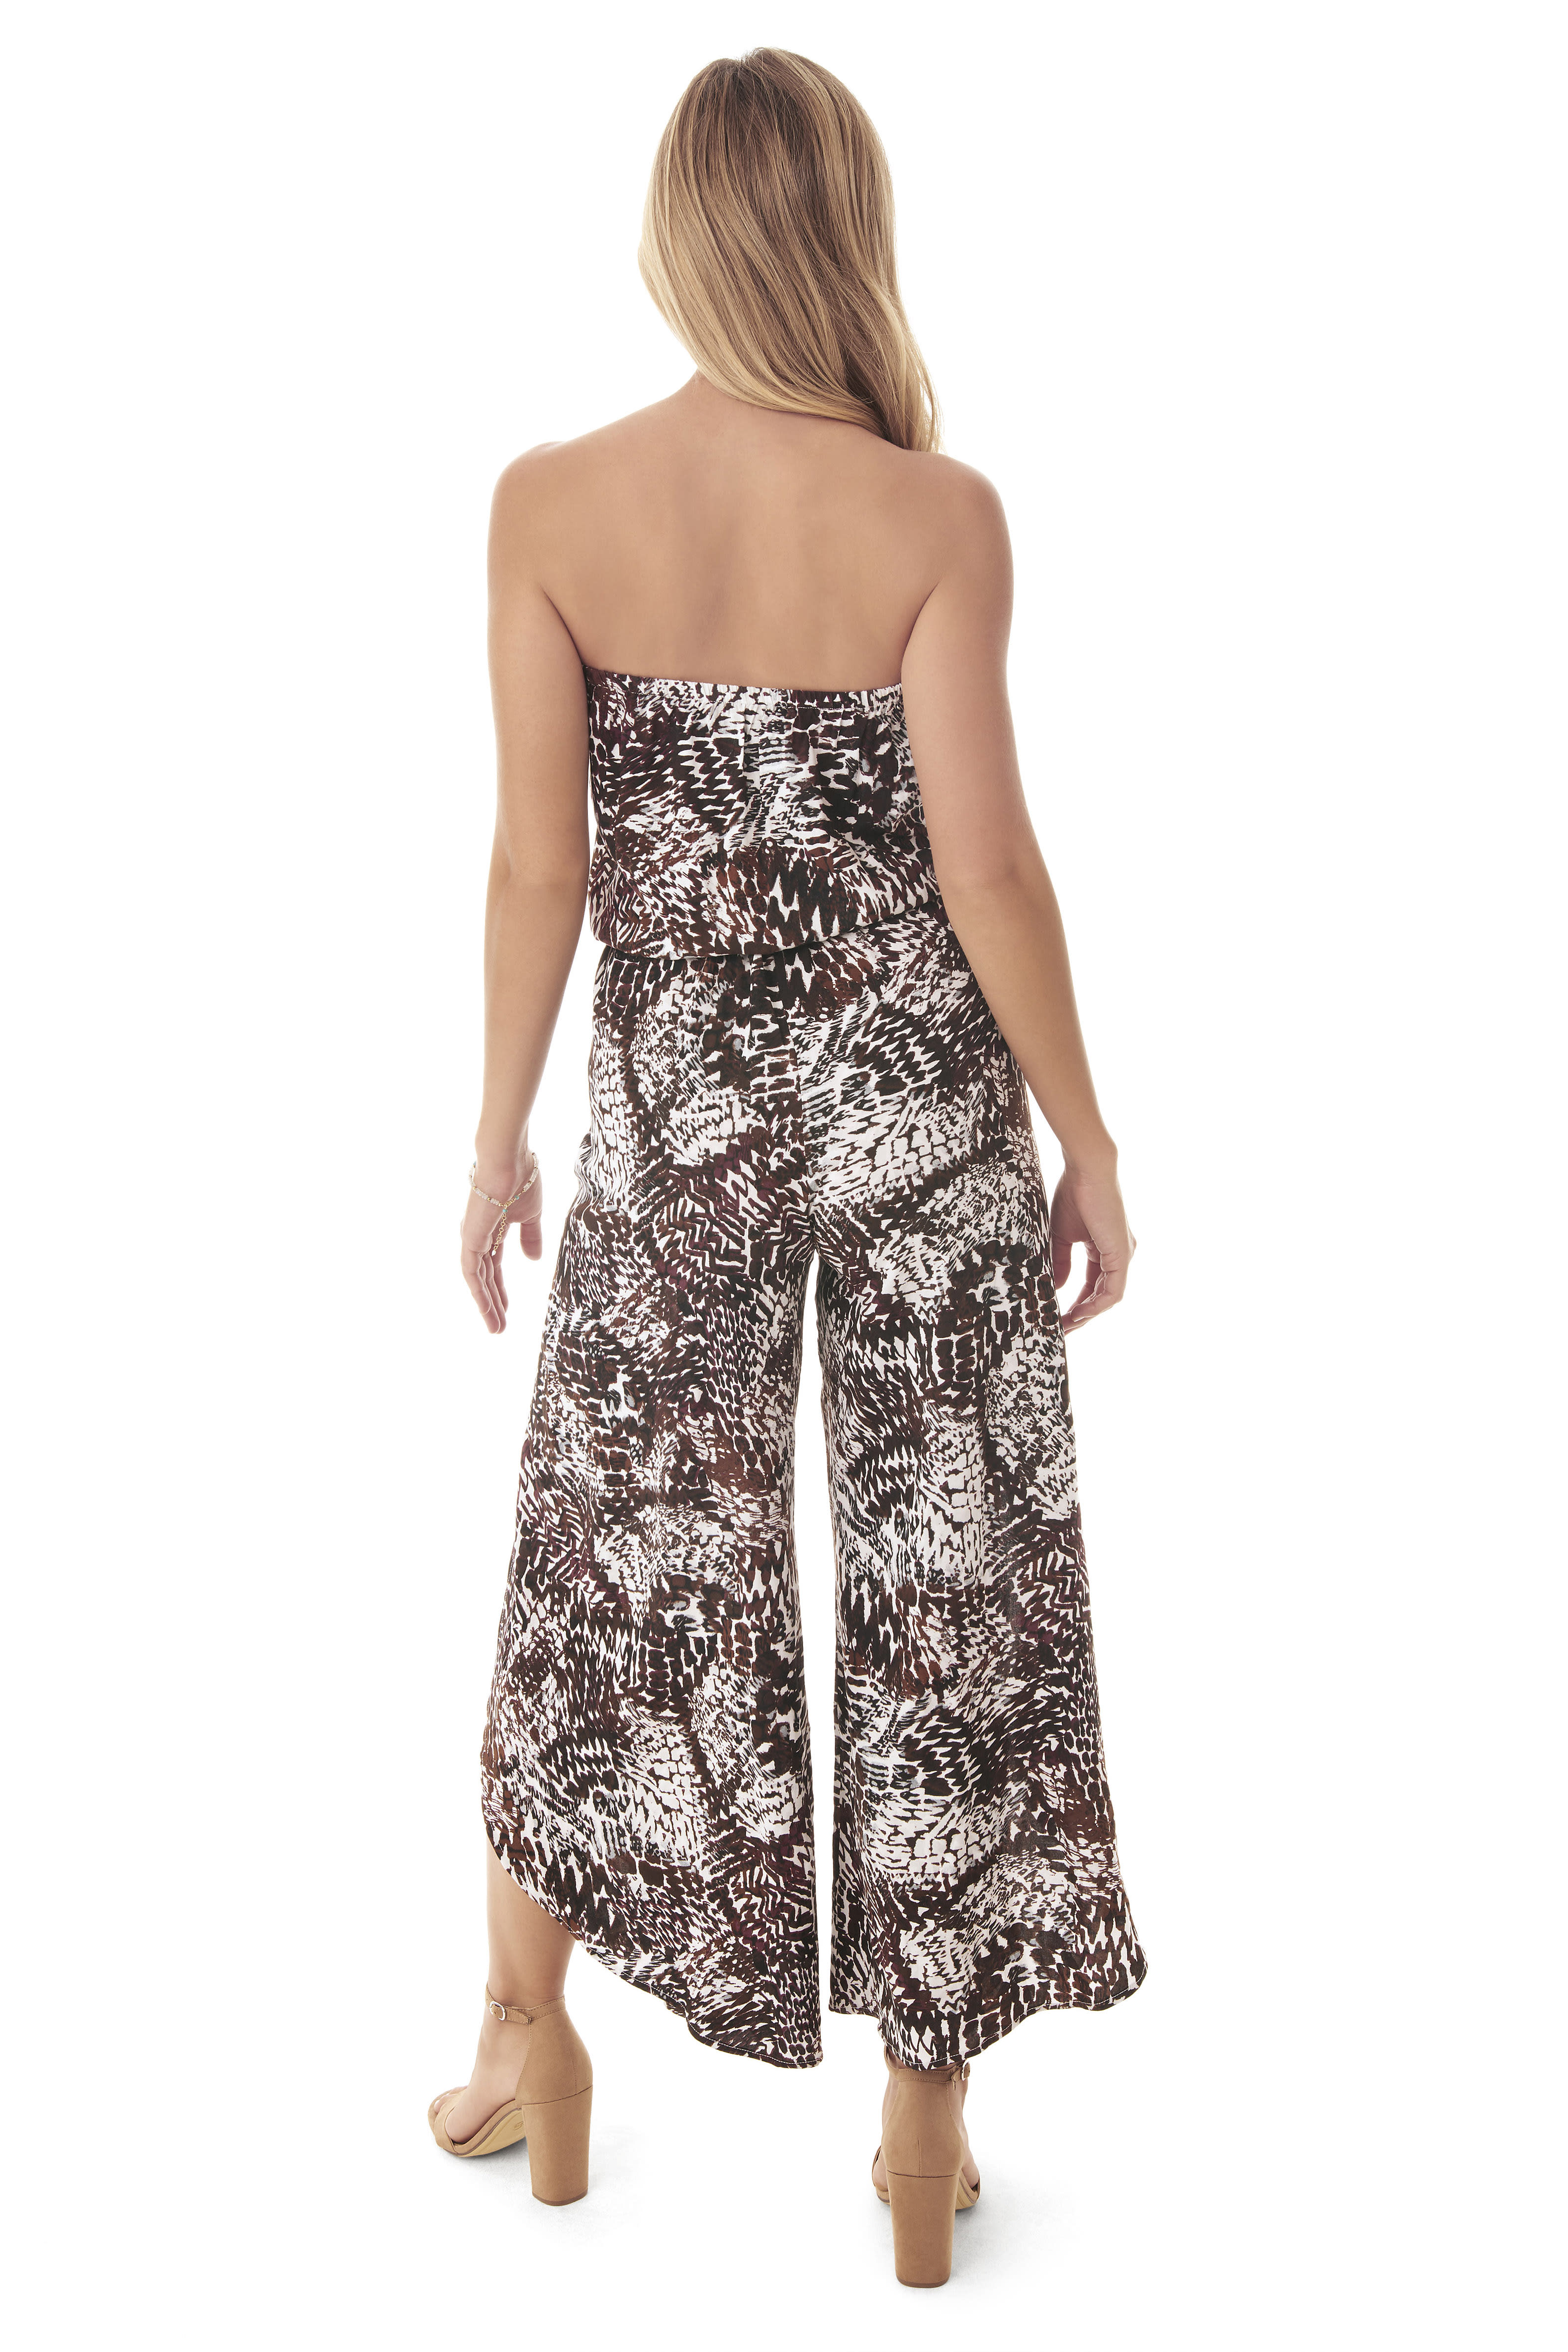 Penbrooke Bandeau Jumpsuit Swimsuit Cover-Up - Multi - Back